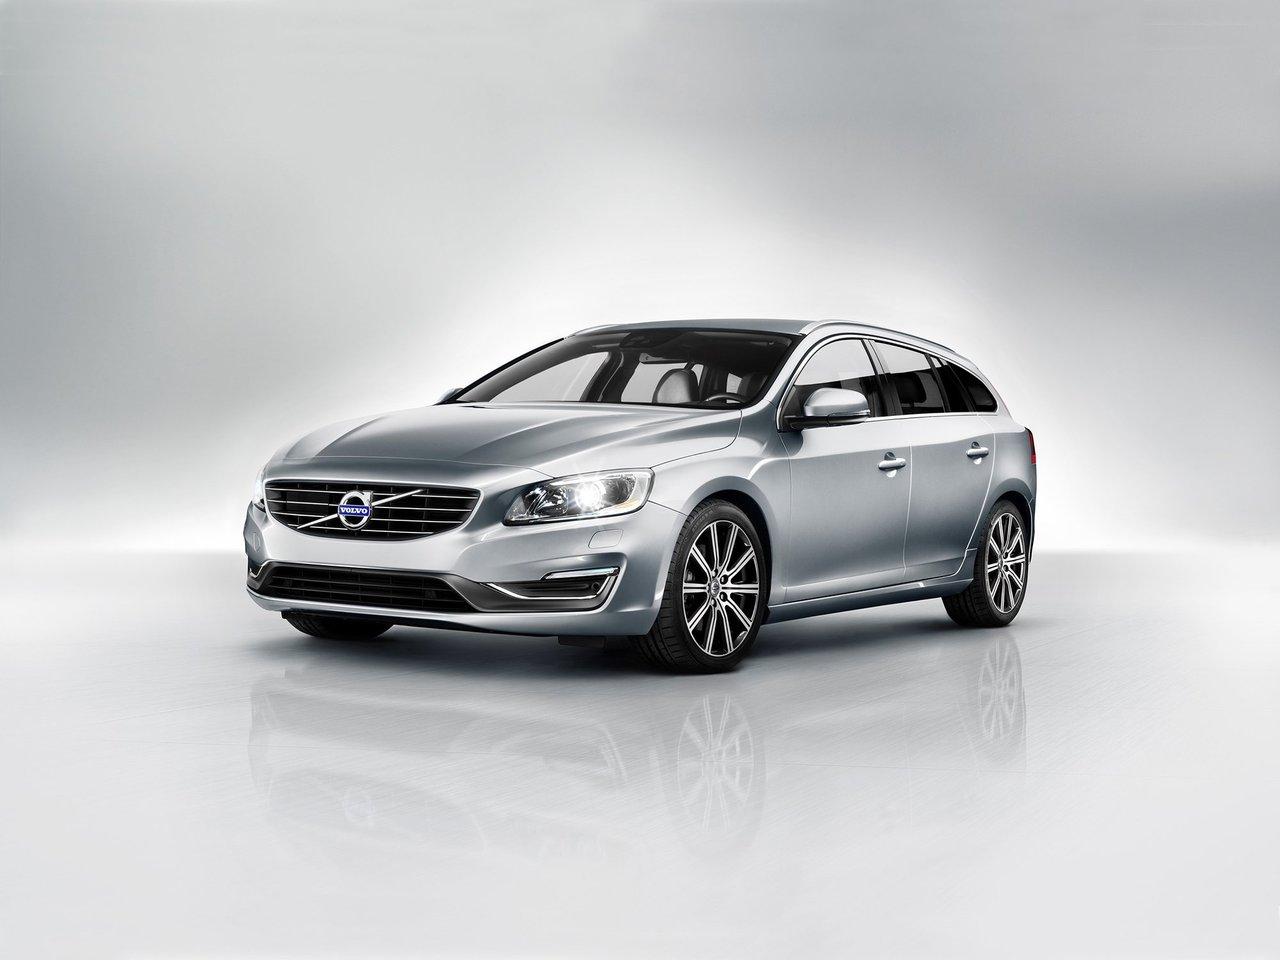 Снимки: Volvo V60